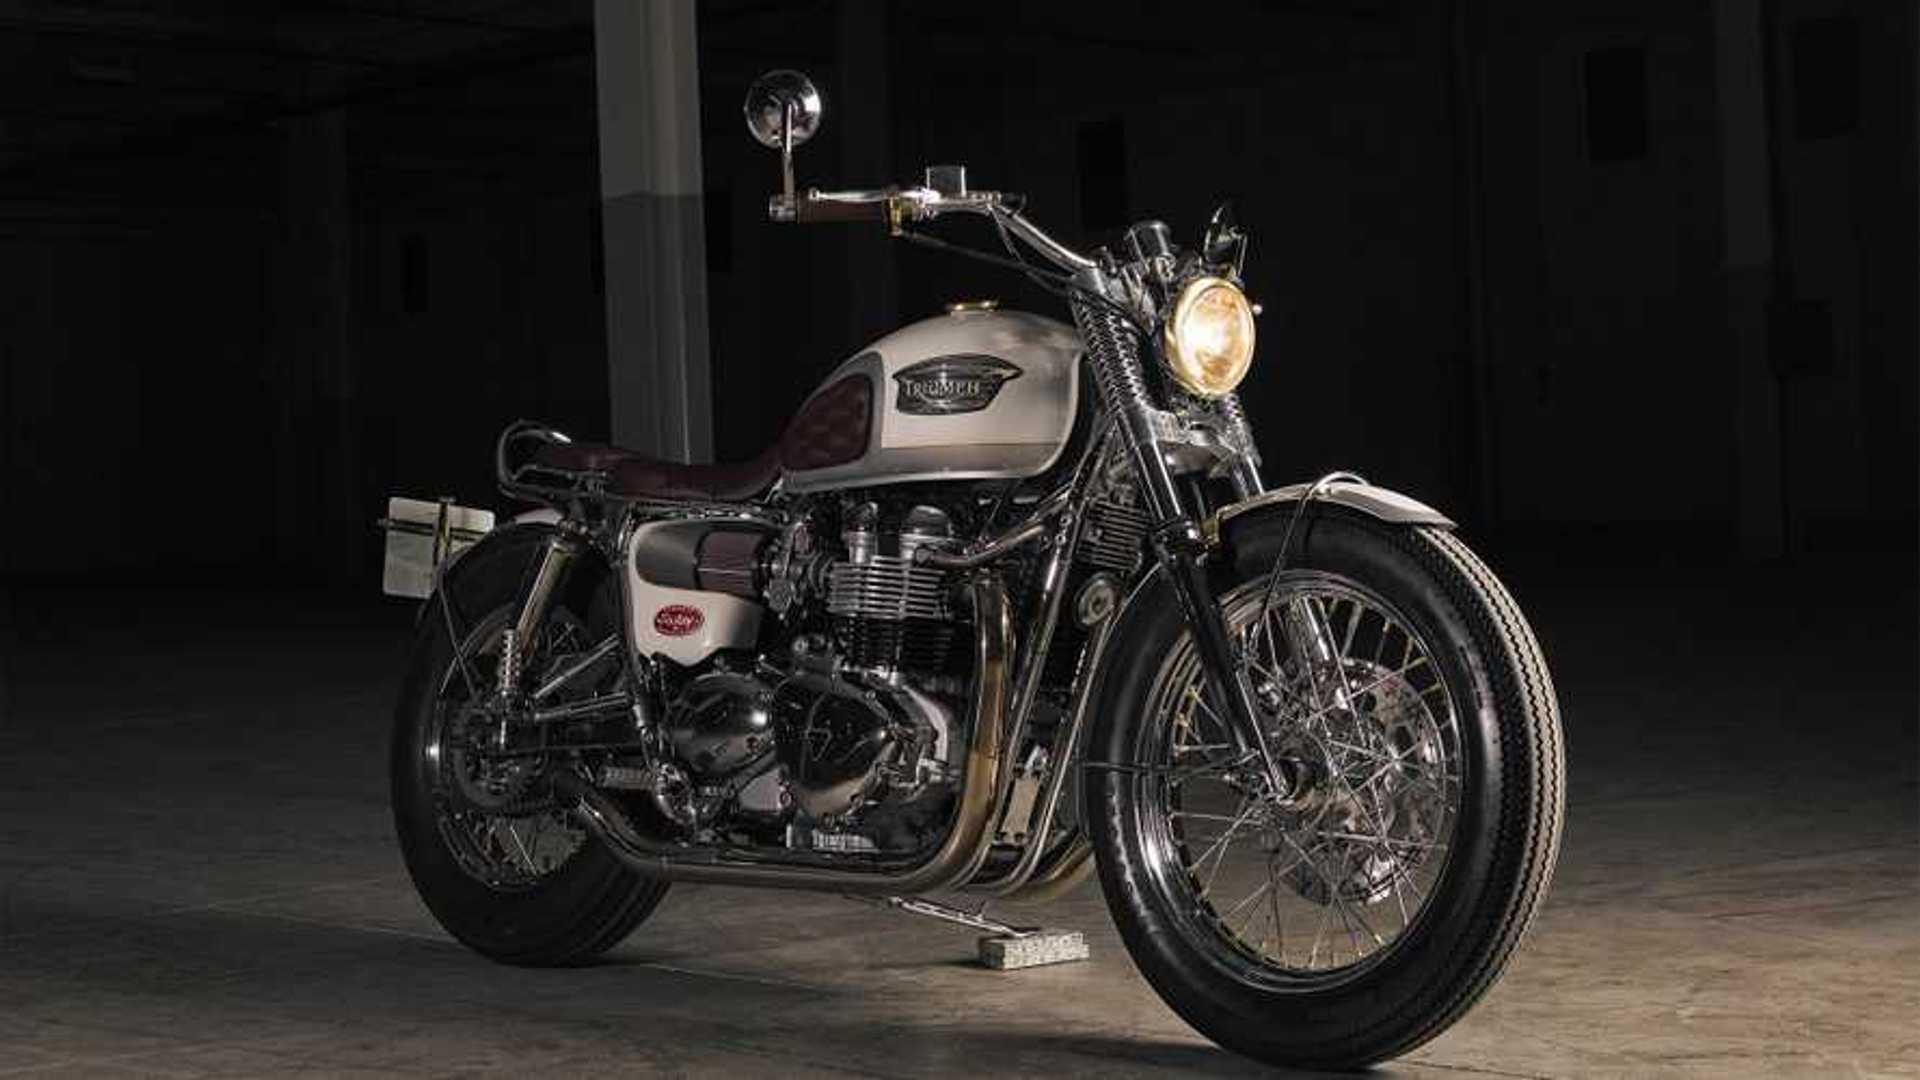 Check Out This Gorgeous Custom Bonneville